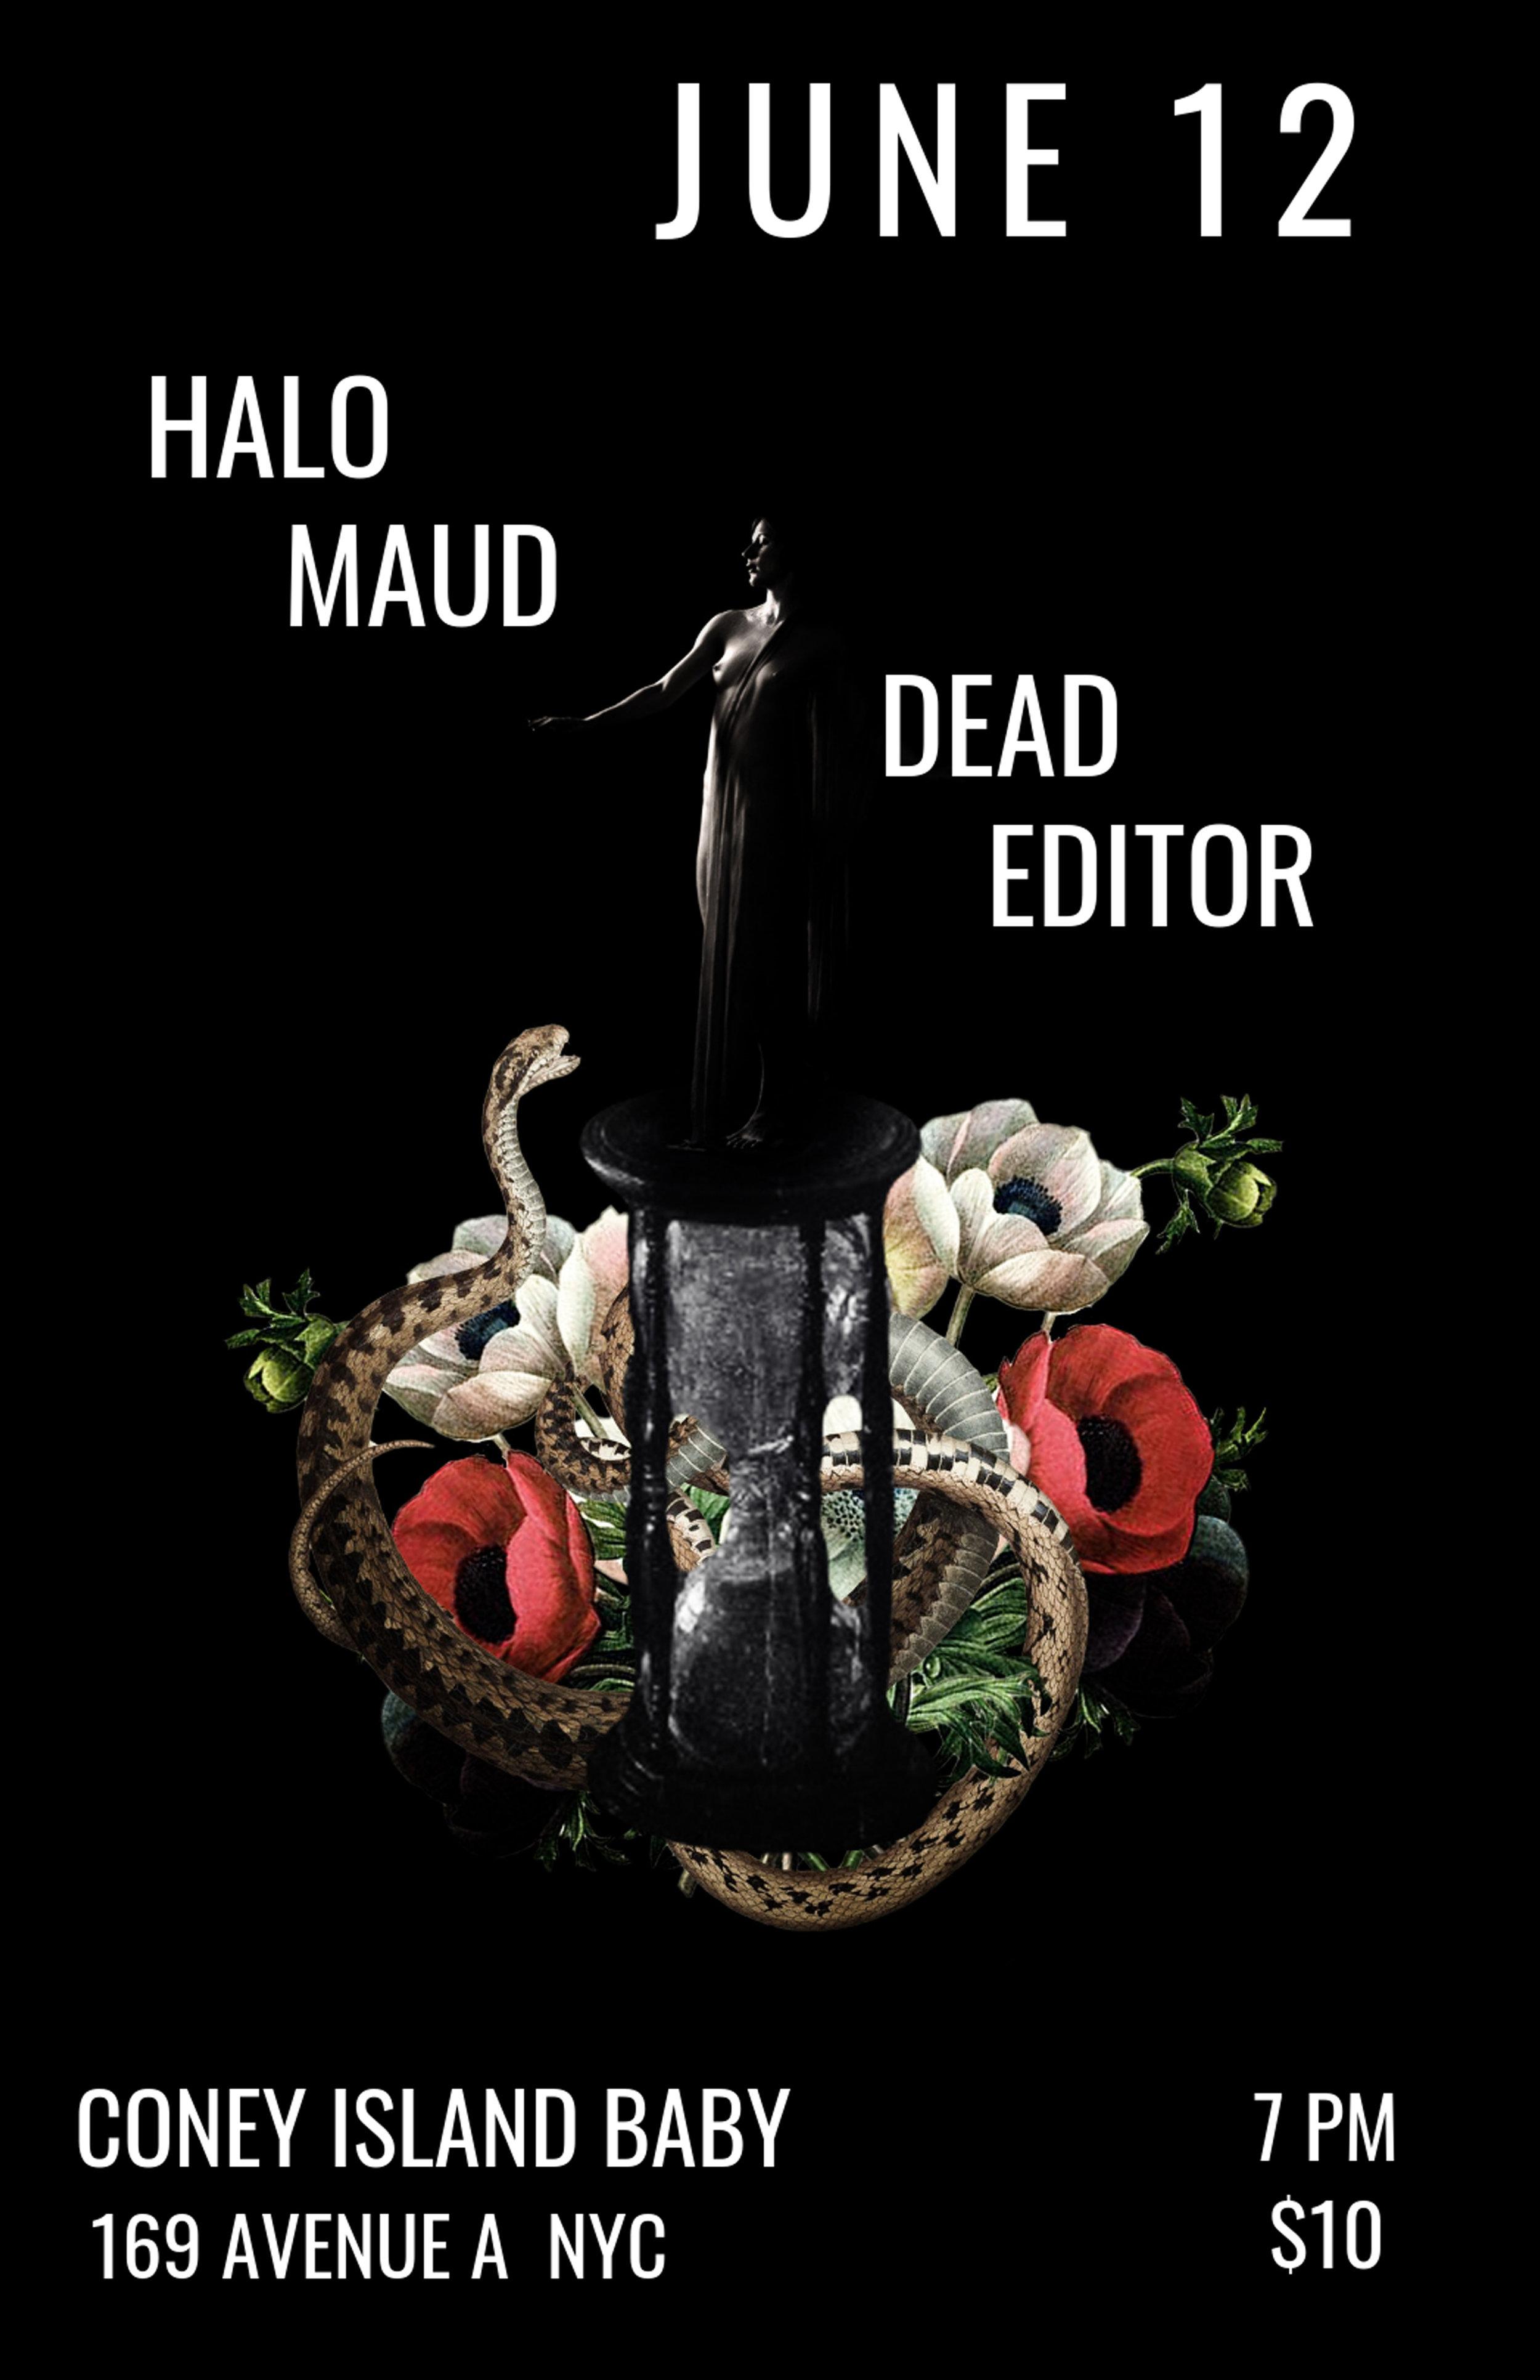 june 12 dead editor halo maud poster.jpg